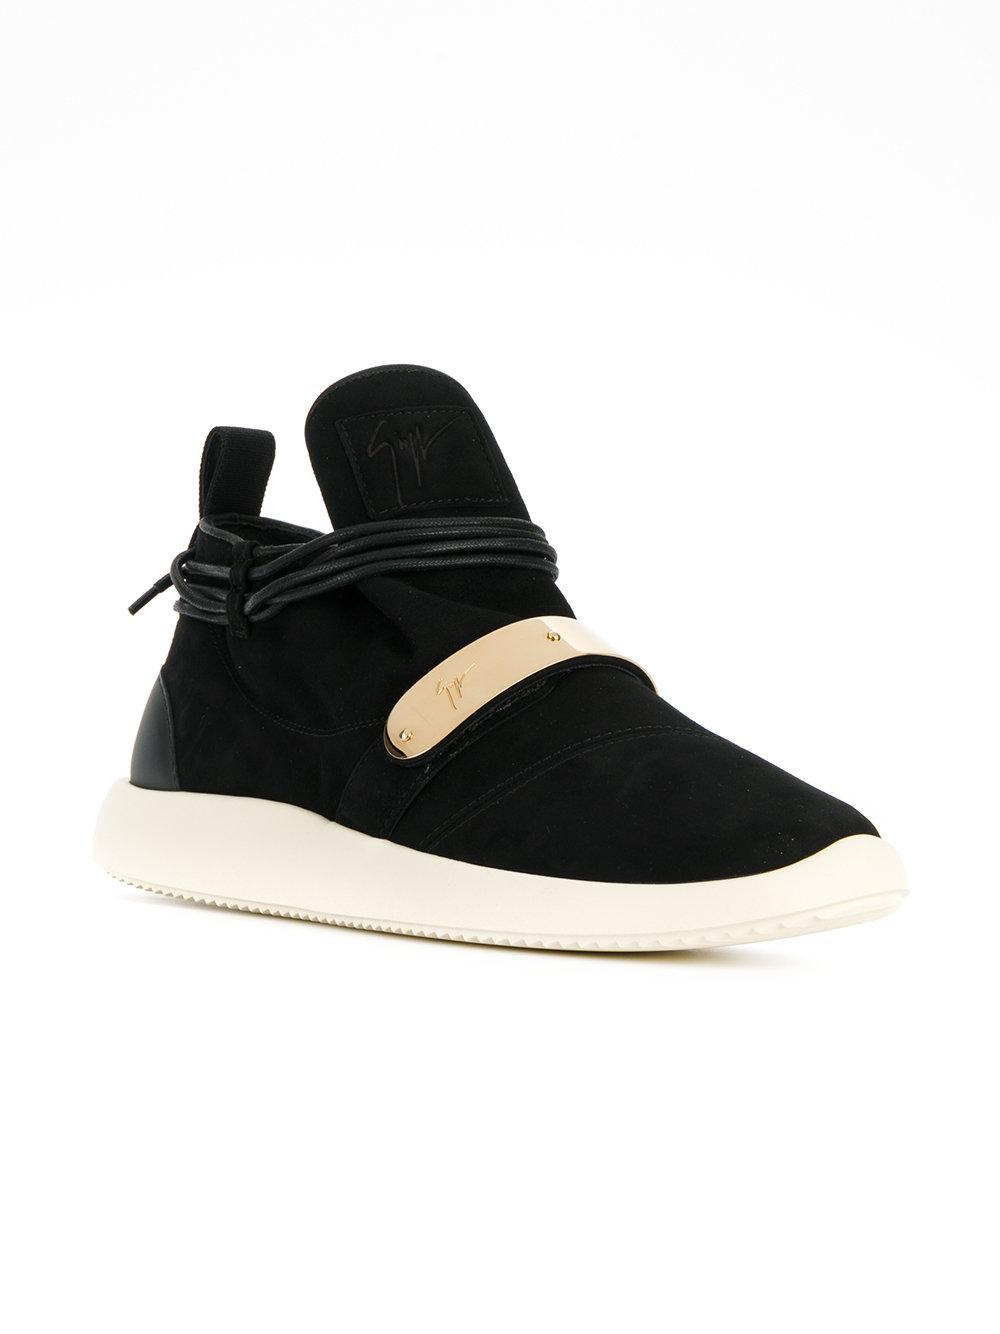 Hayden mid-top sneakers - Black Giuseppe Zanotti hyrfQZp1j